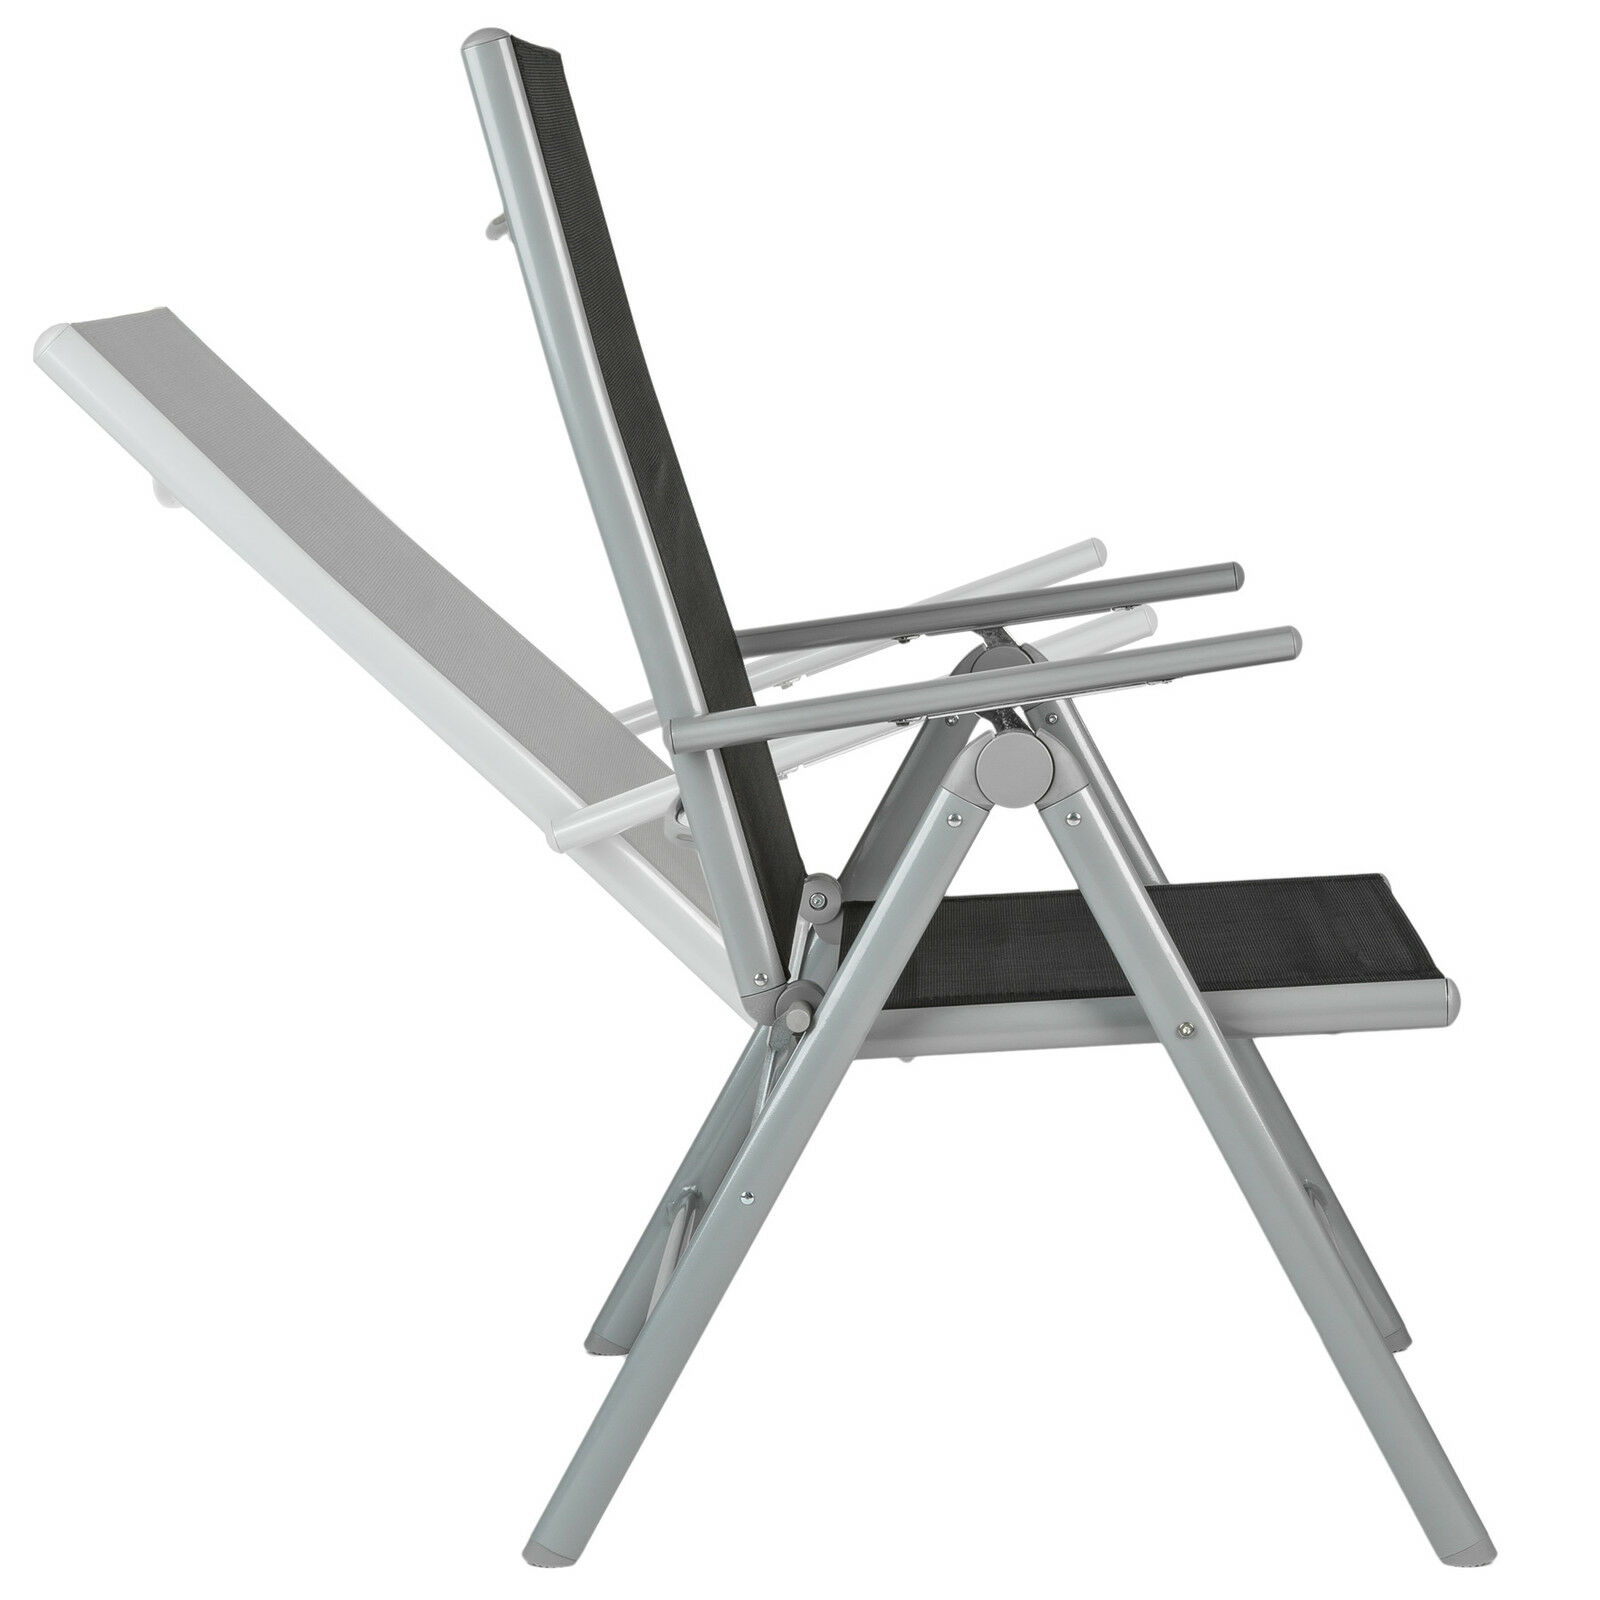 Aluminio conjunto muebles de jardin 4 1 silla adjustable for Sillas jardin aluminio baratas